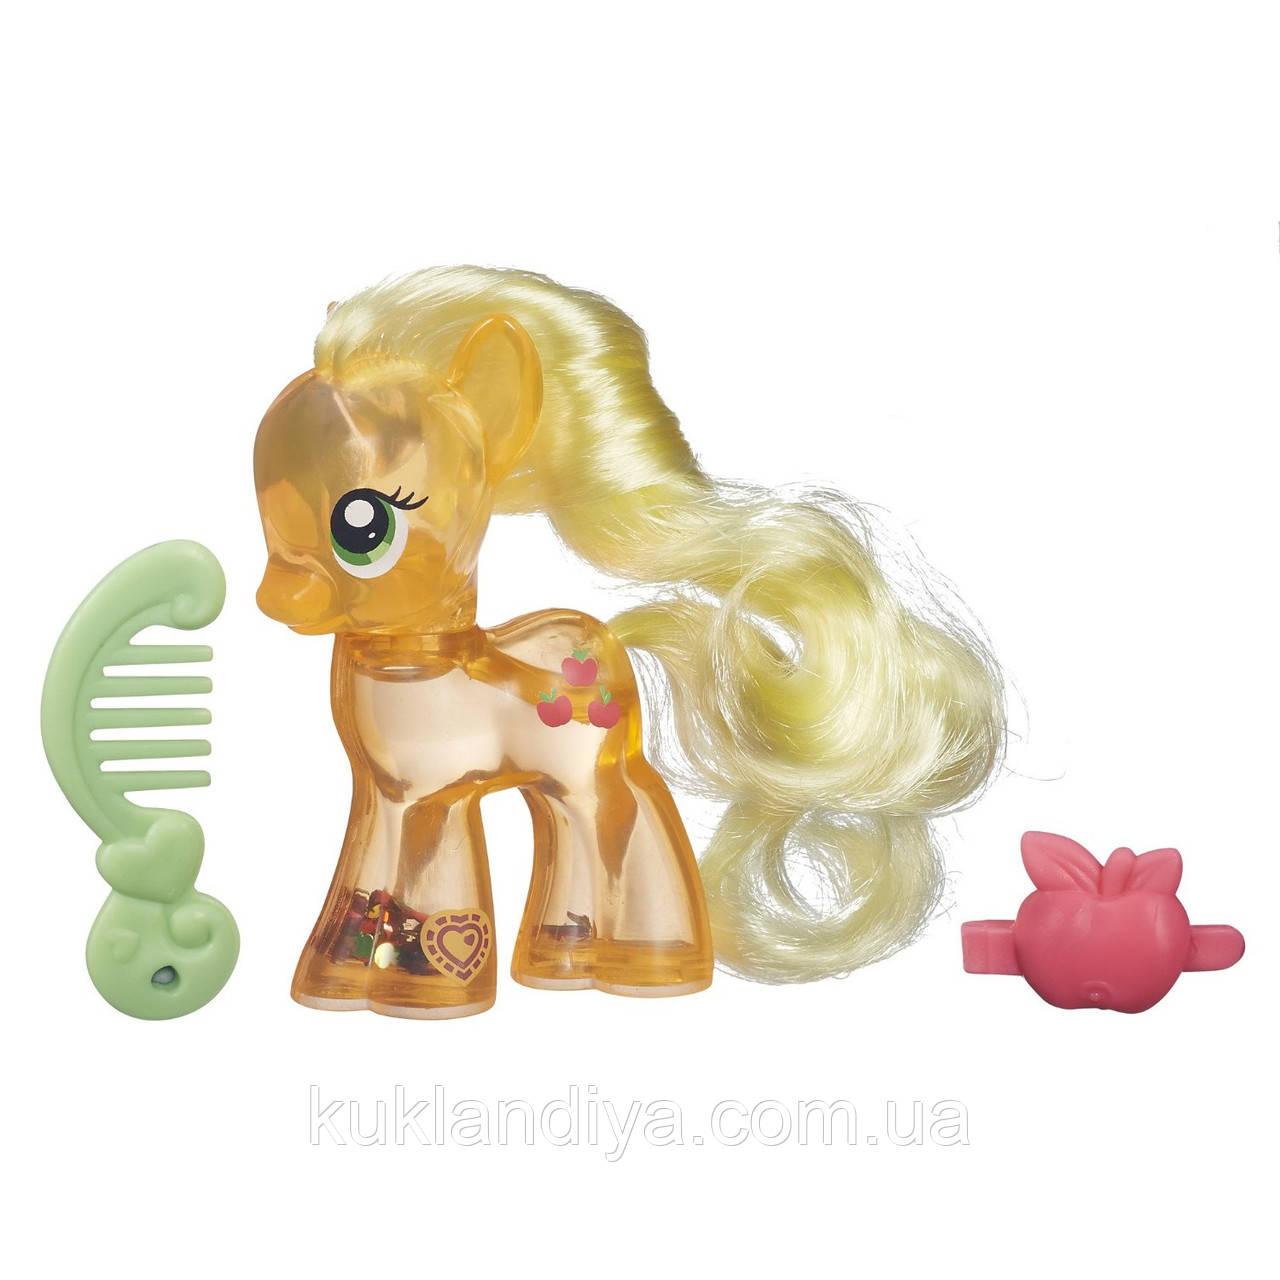 My Little Pony Прозрачная Пони Эппл джек